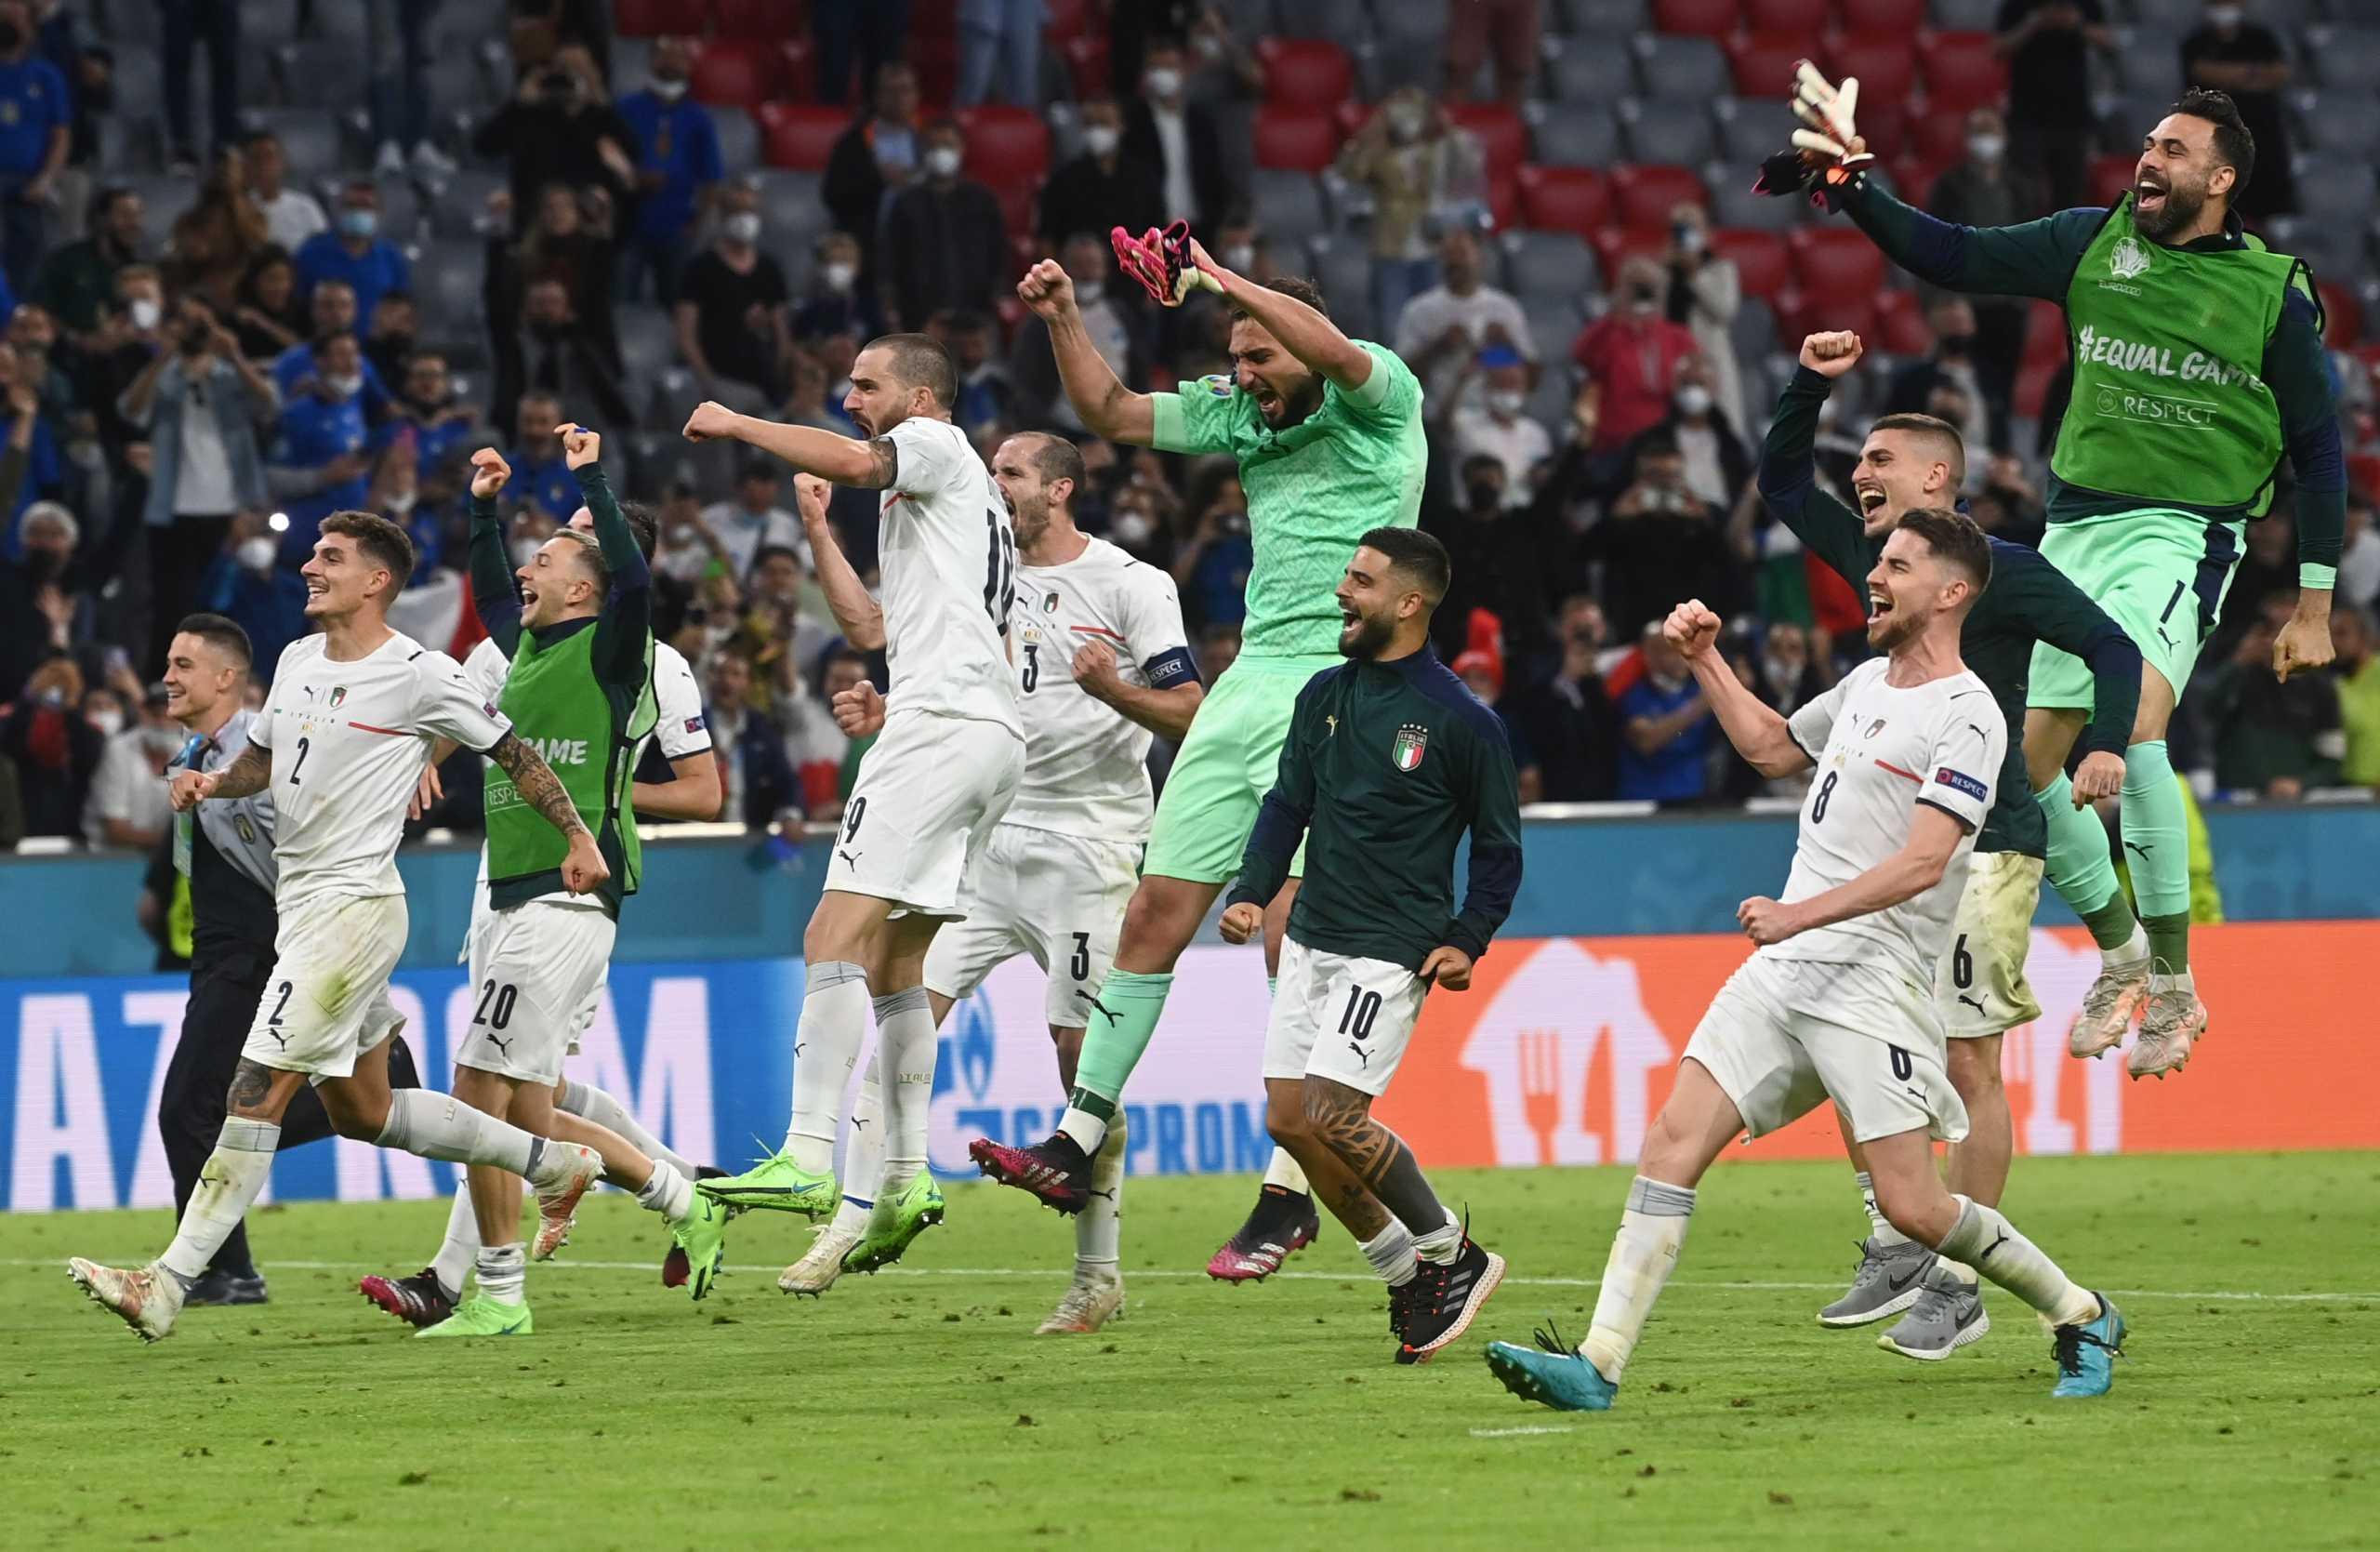 Euro 2020, Βέλγιο – Ιταλία: Το δραματικό φινάλε